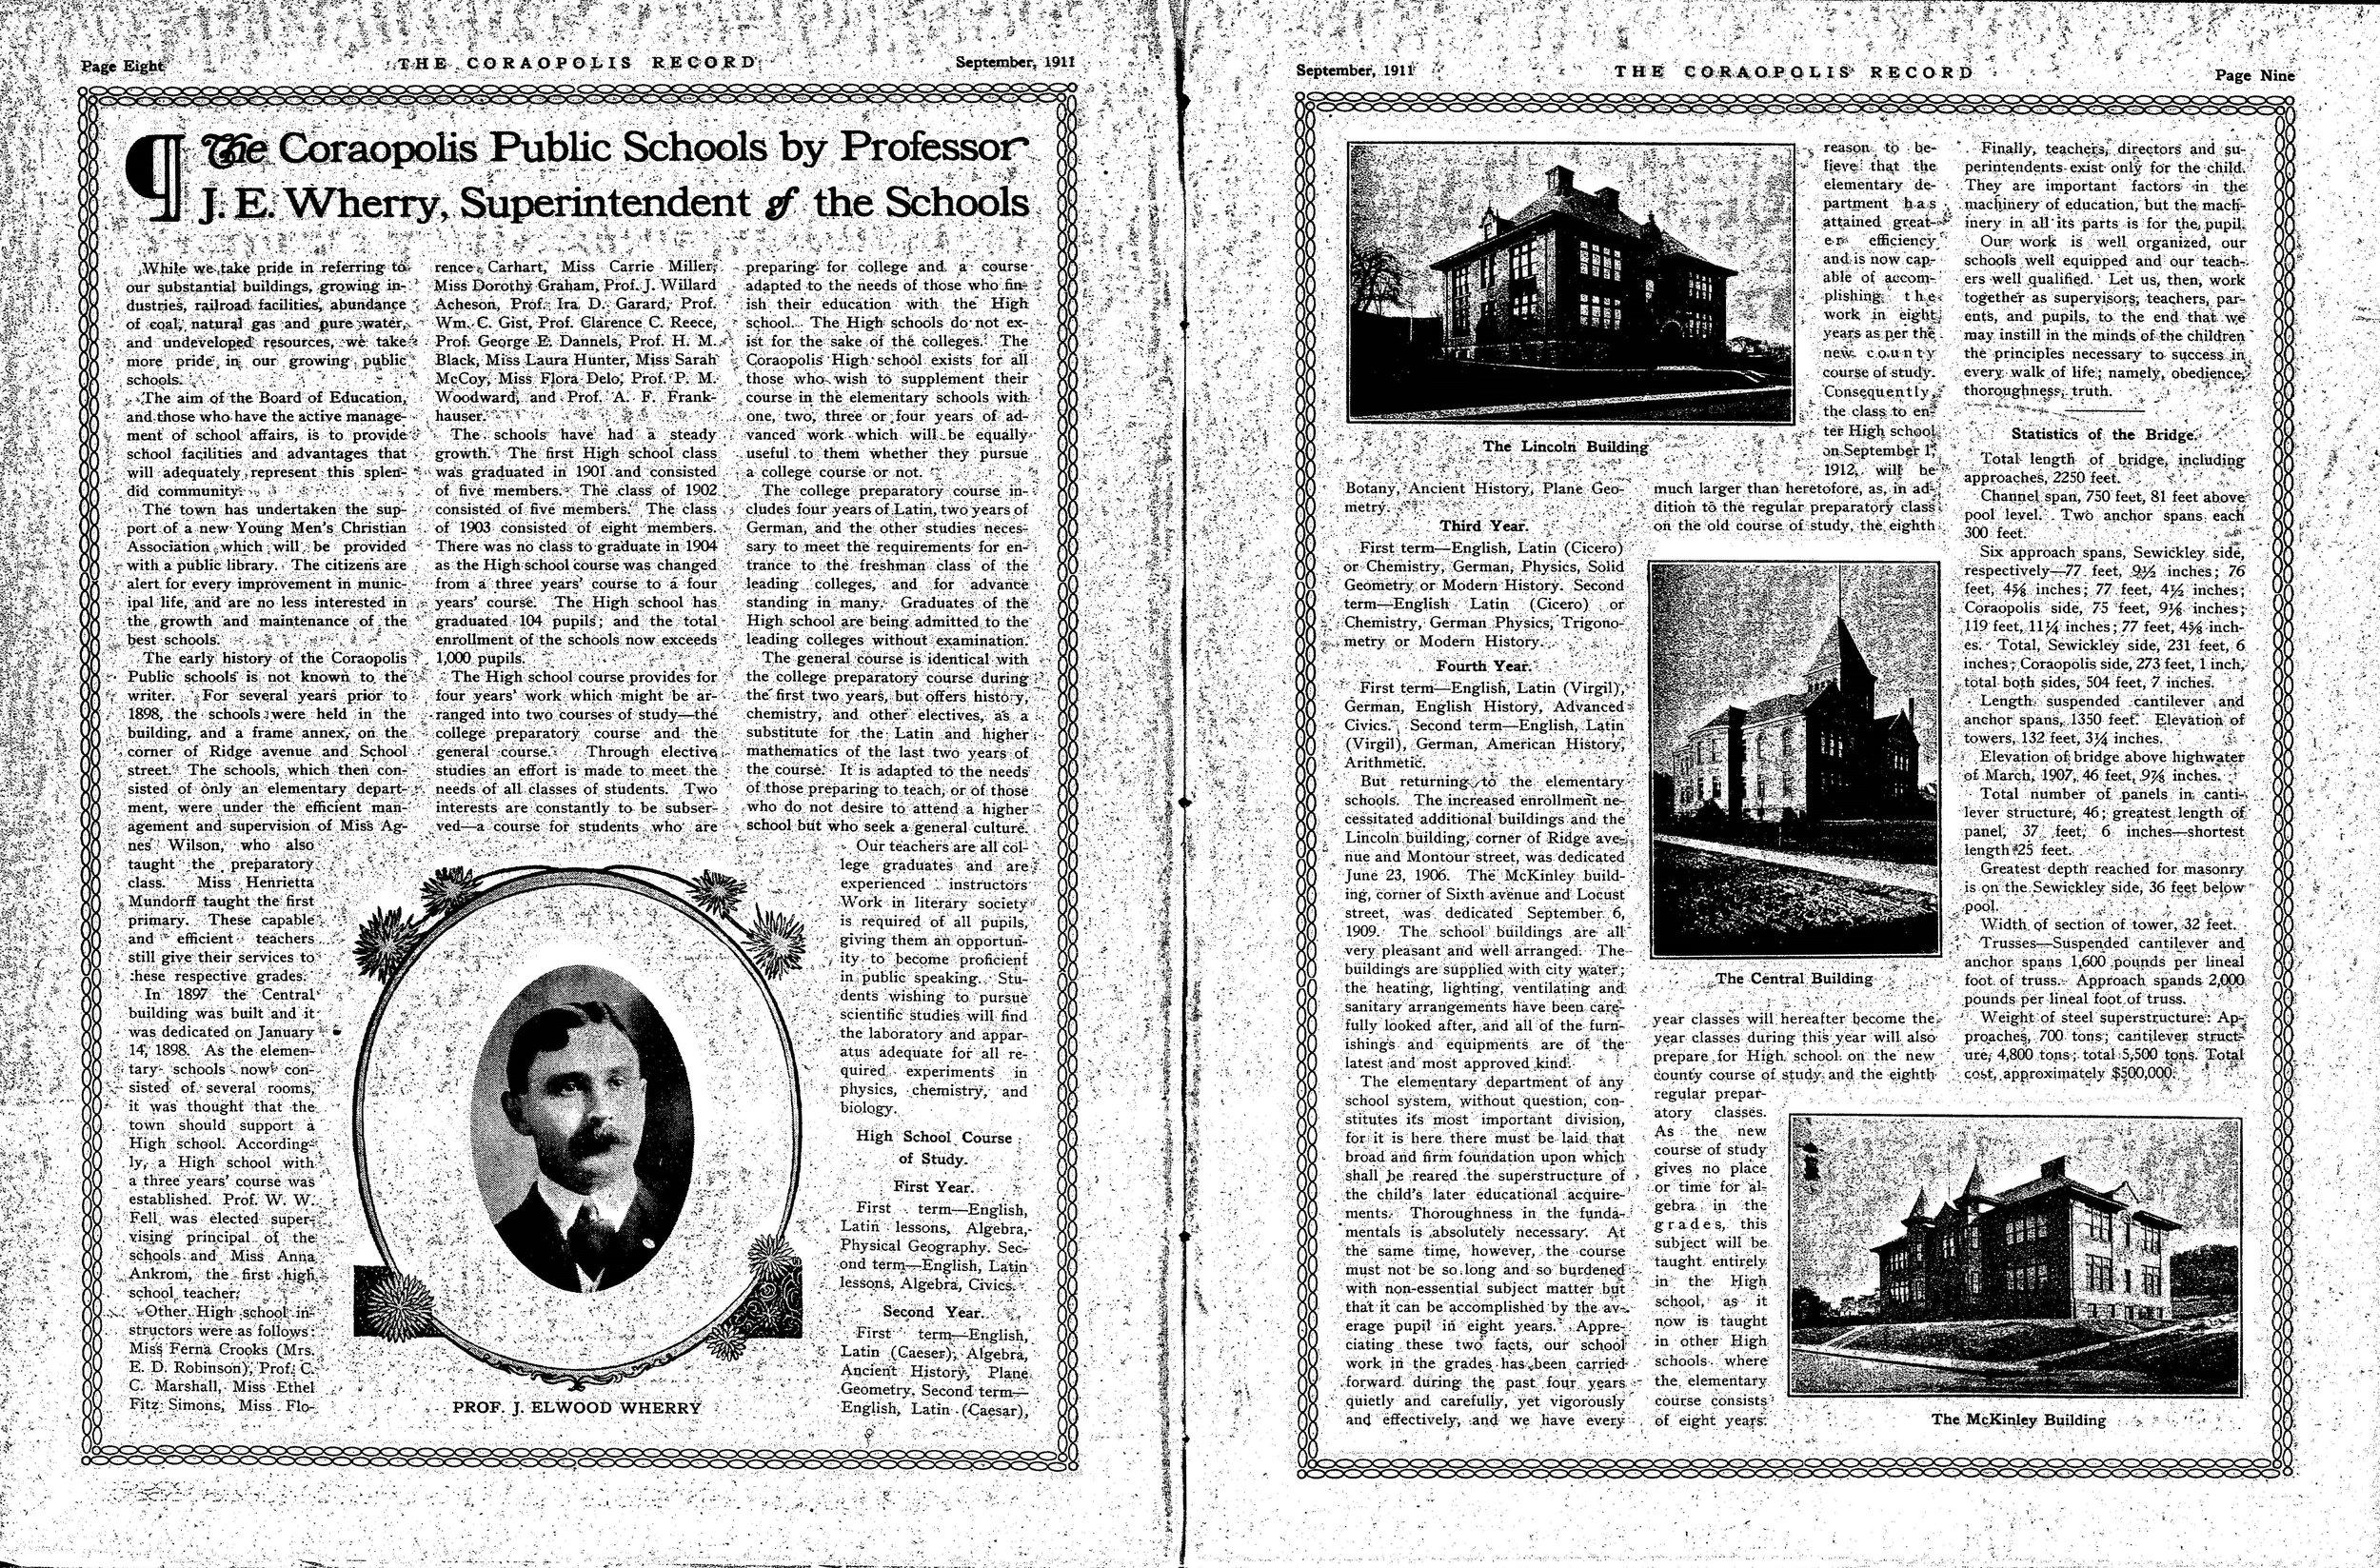 1911-09-15 The Coraopolis Record_Page_07.jpg